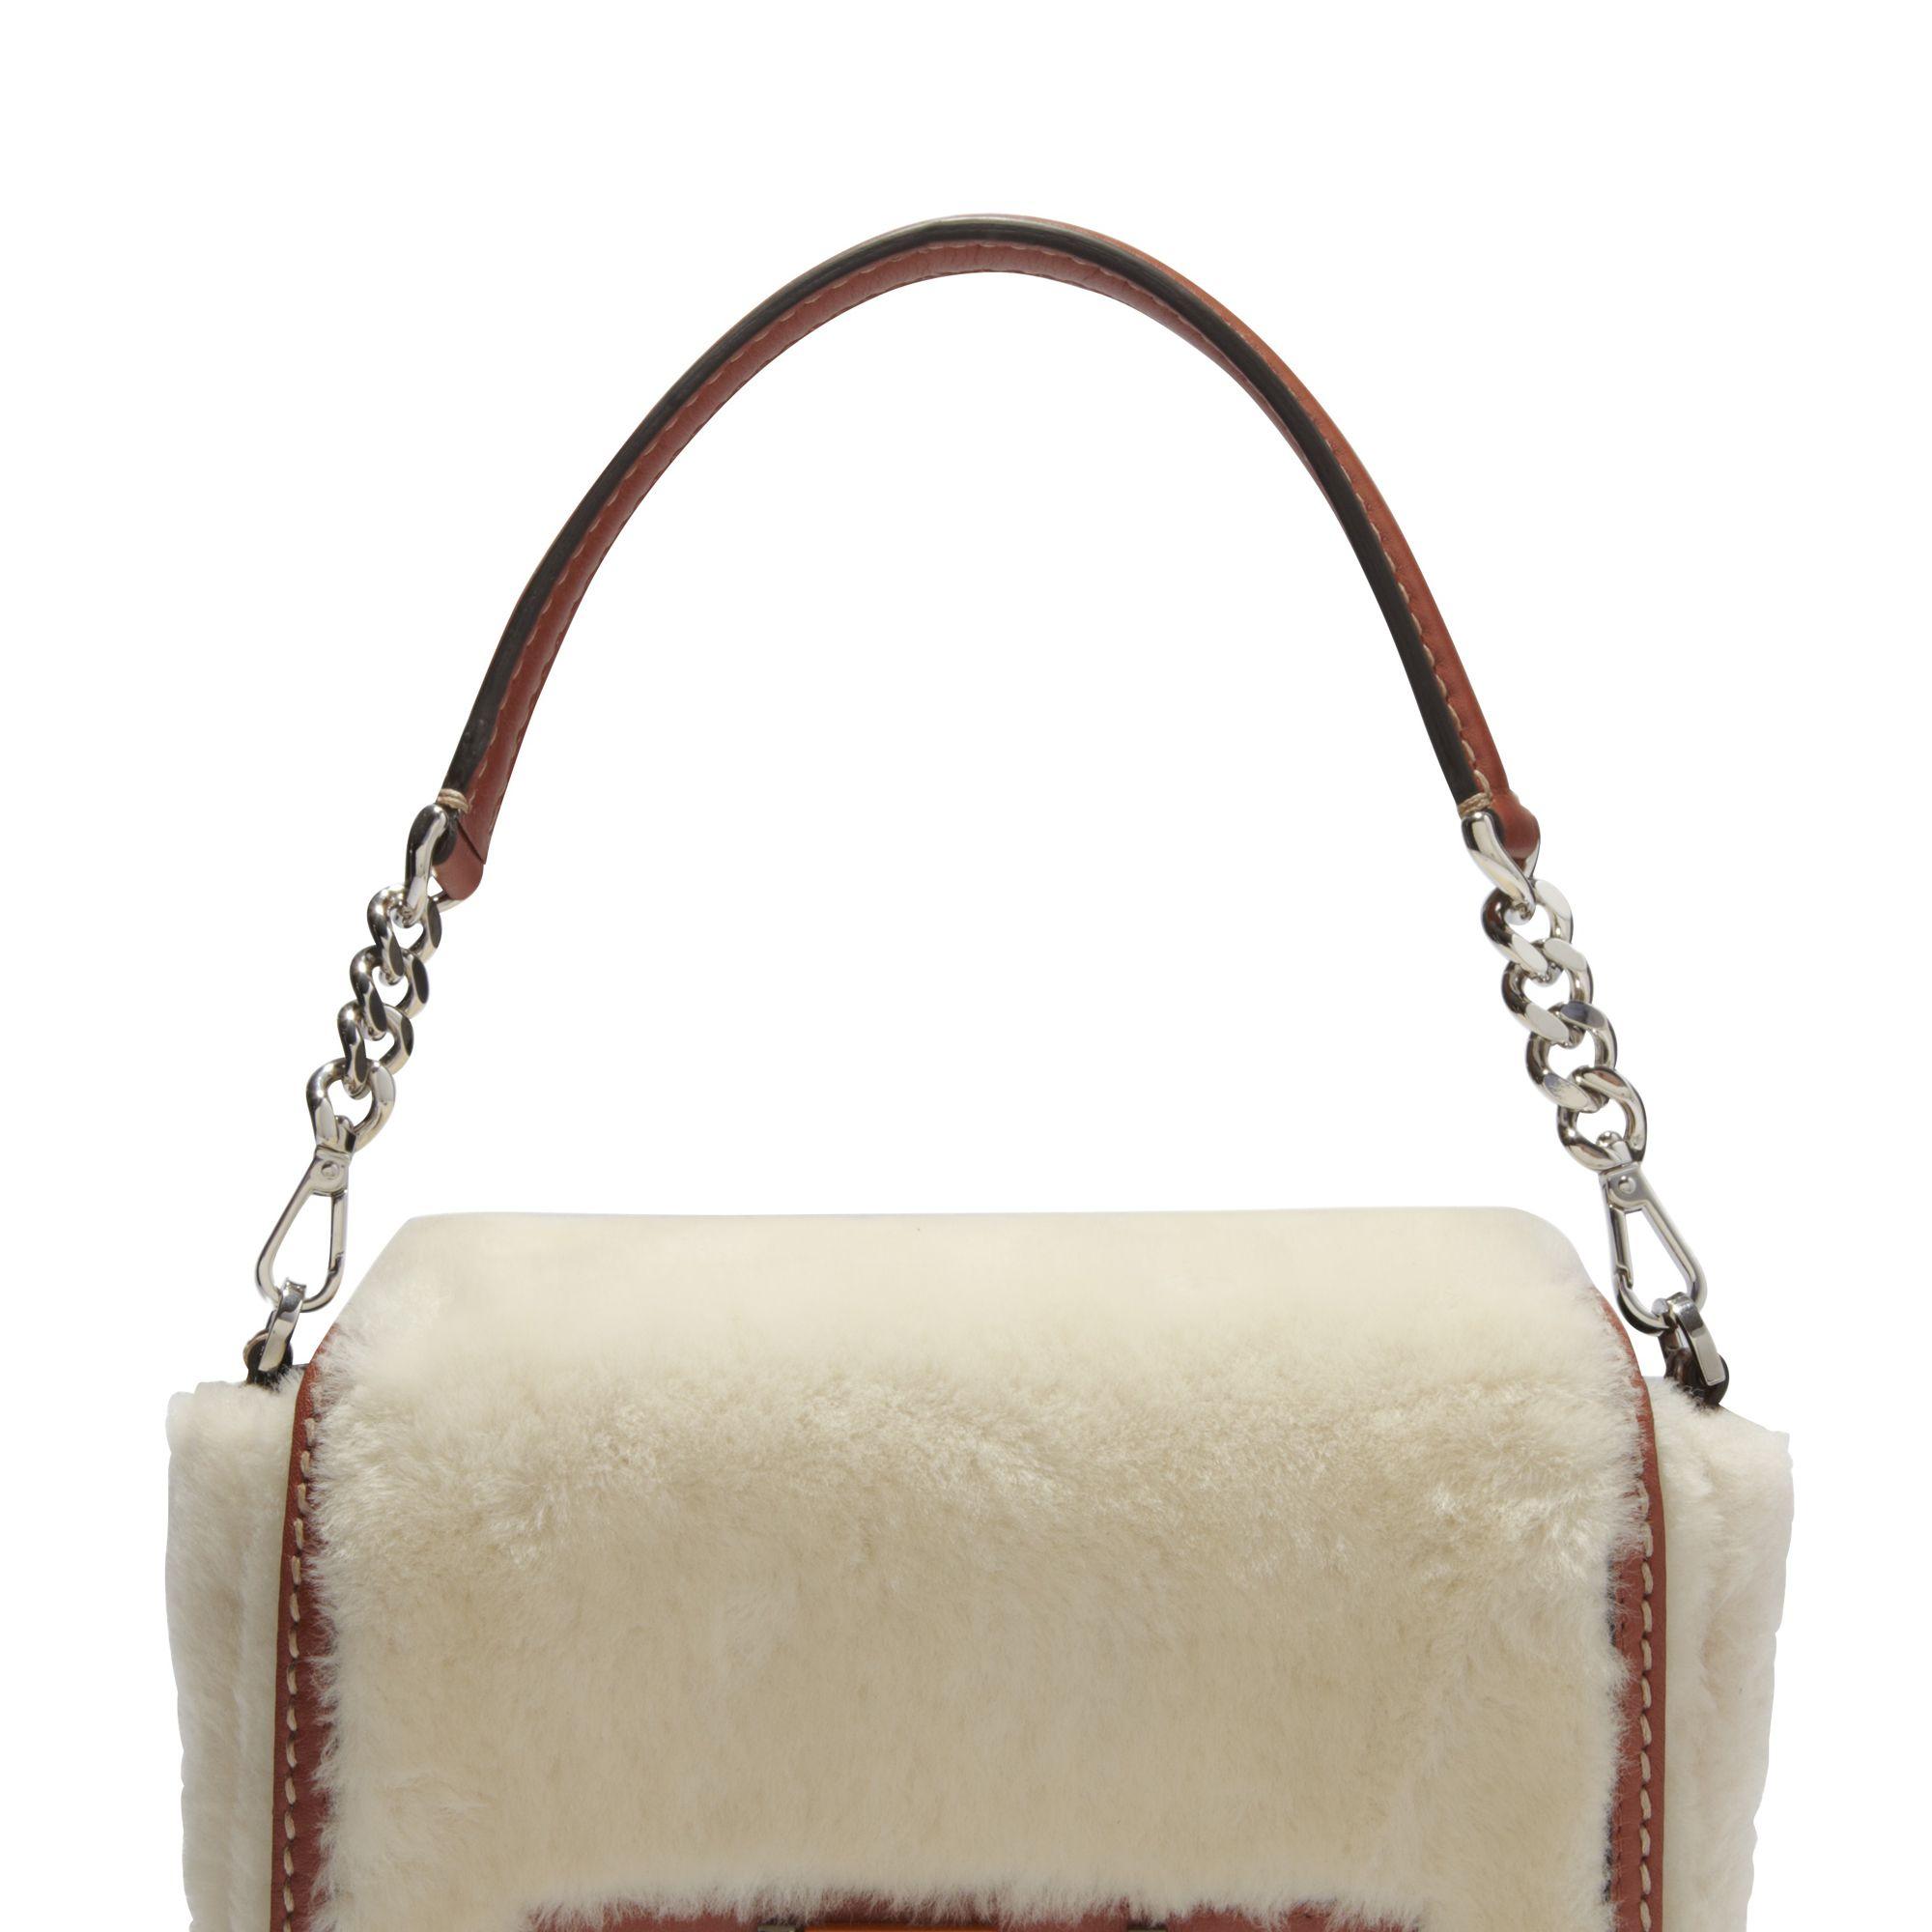 <p><strong>Fendi</strong> bag, $3,250, 212-897-2244.</p>